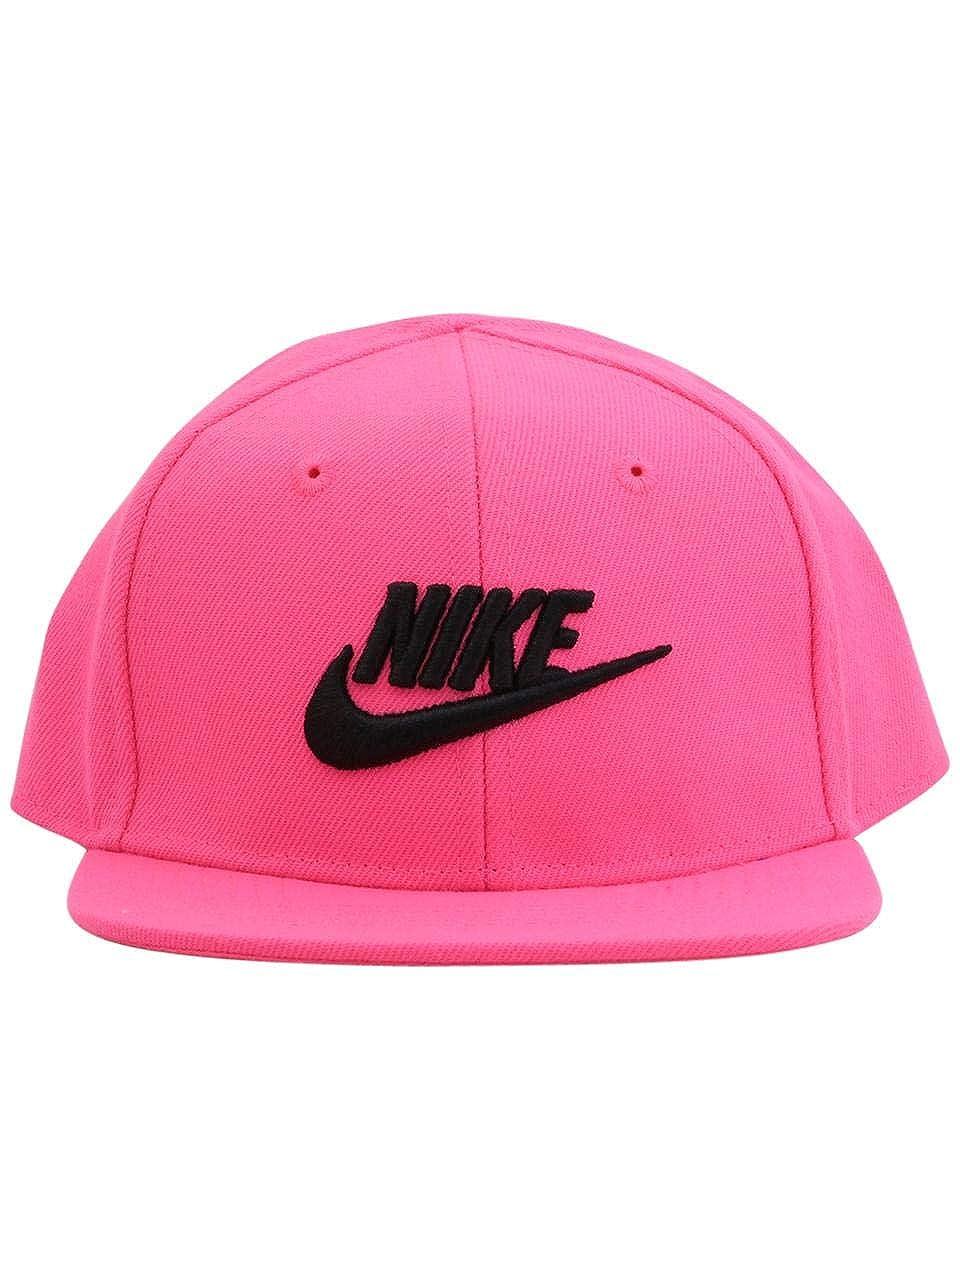 16375943d6e Amazon.com  NIKE Infant Toddler Girl s Snapback Baseball Cap Hat  Sports    Outdoors